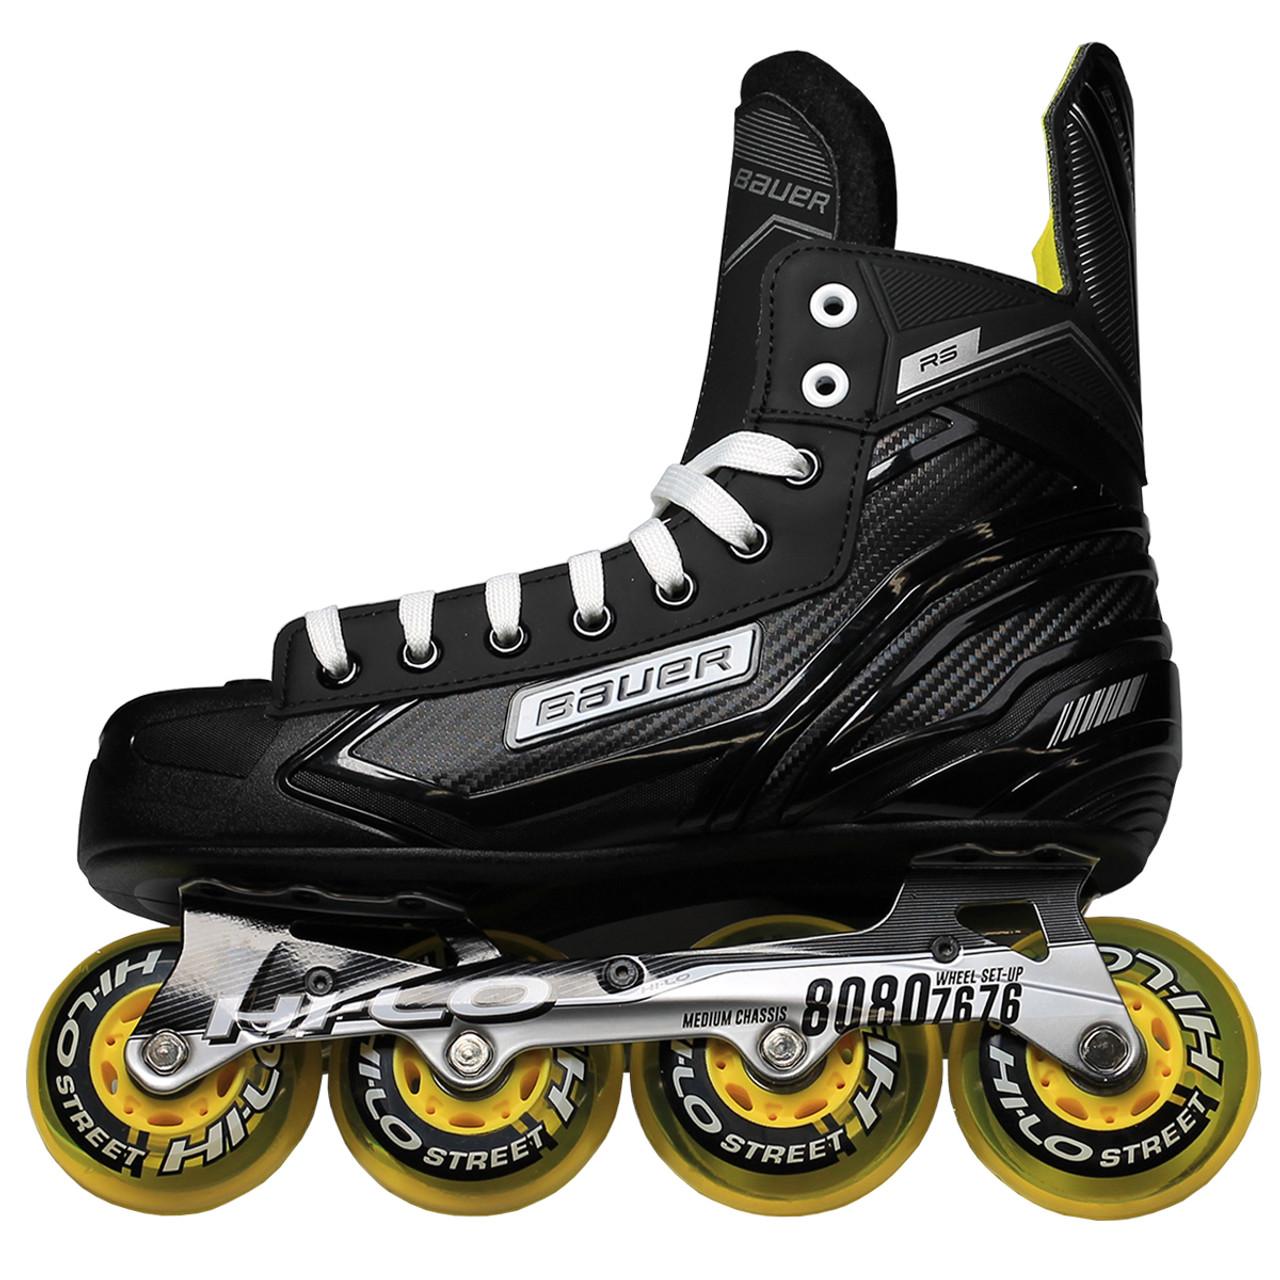 Inliner Bauer Vapor XR400 Senior  Rollhockey Inlinehockey Skates Street Inline-Skates